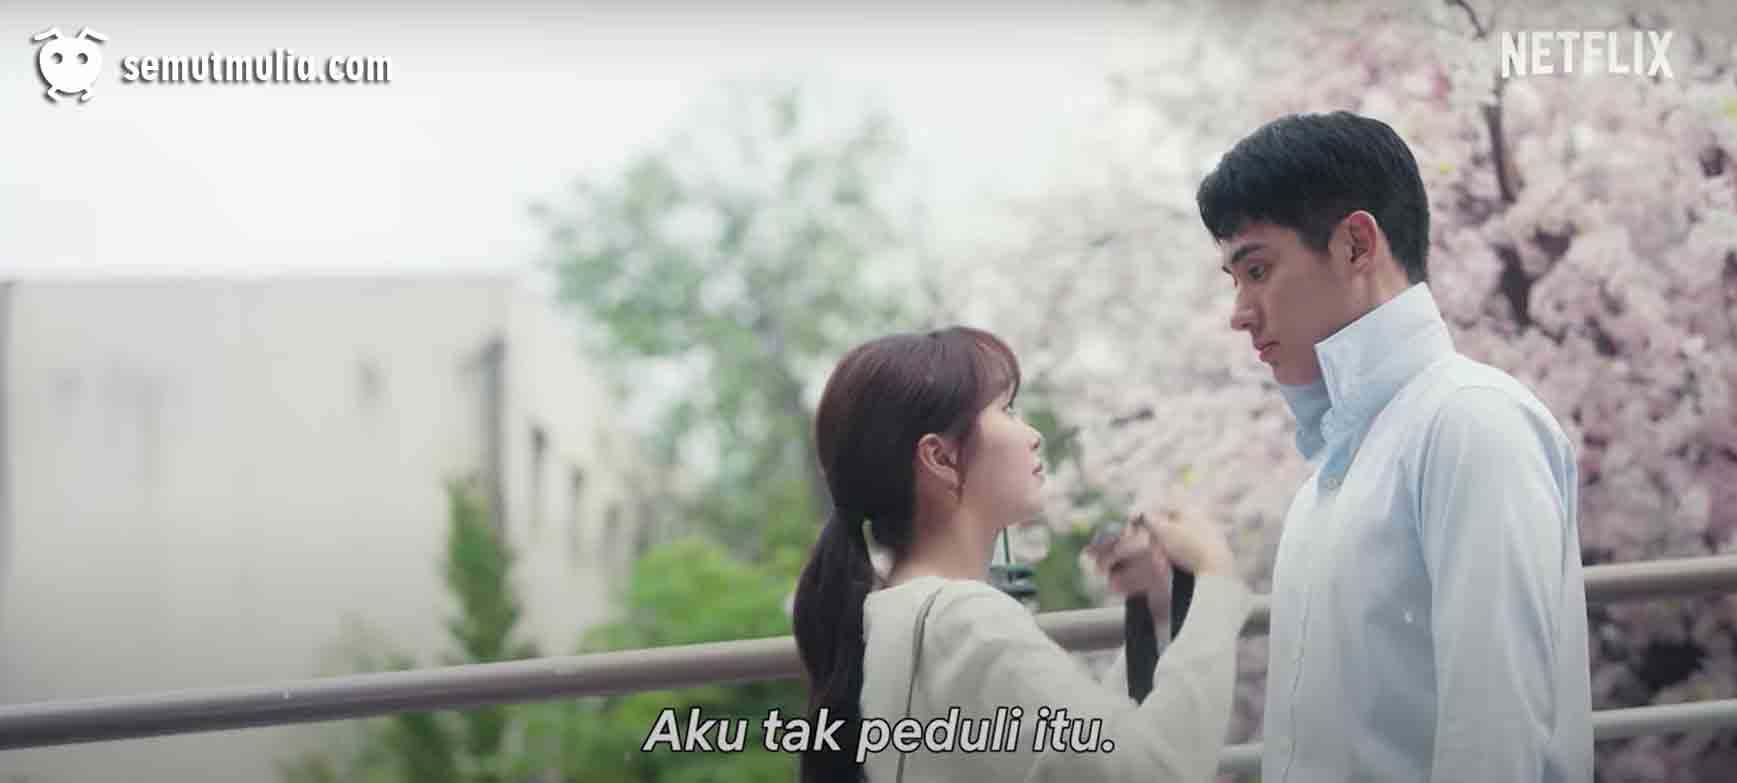 Sinopsis Love Alarm (Youtube : Netflix Indonesia) 3